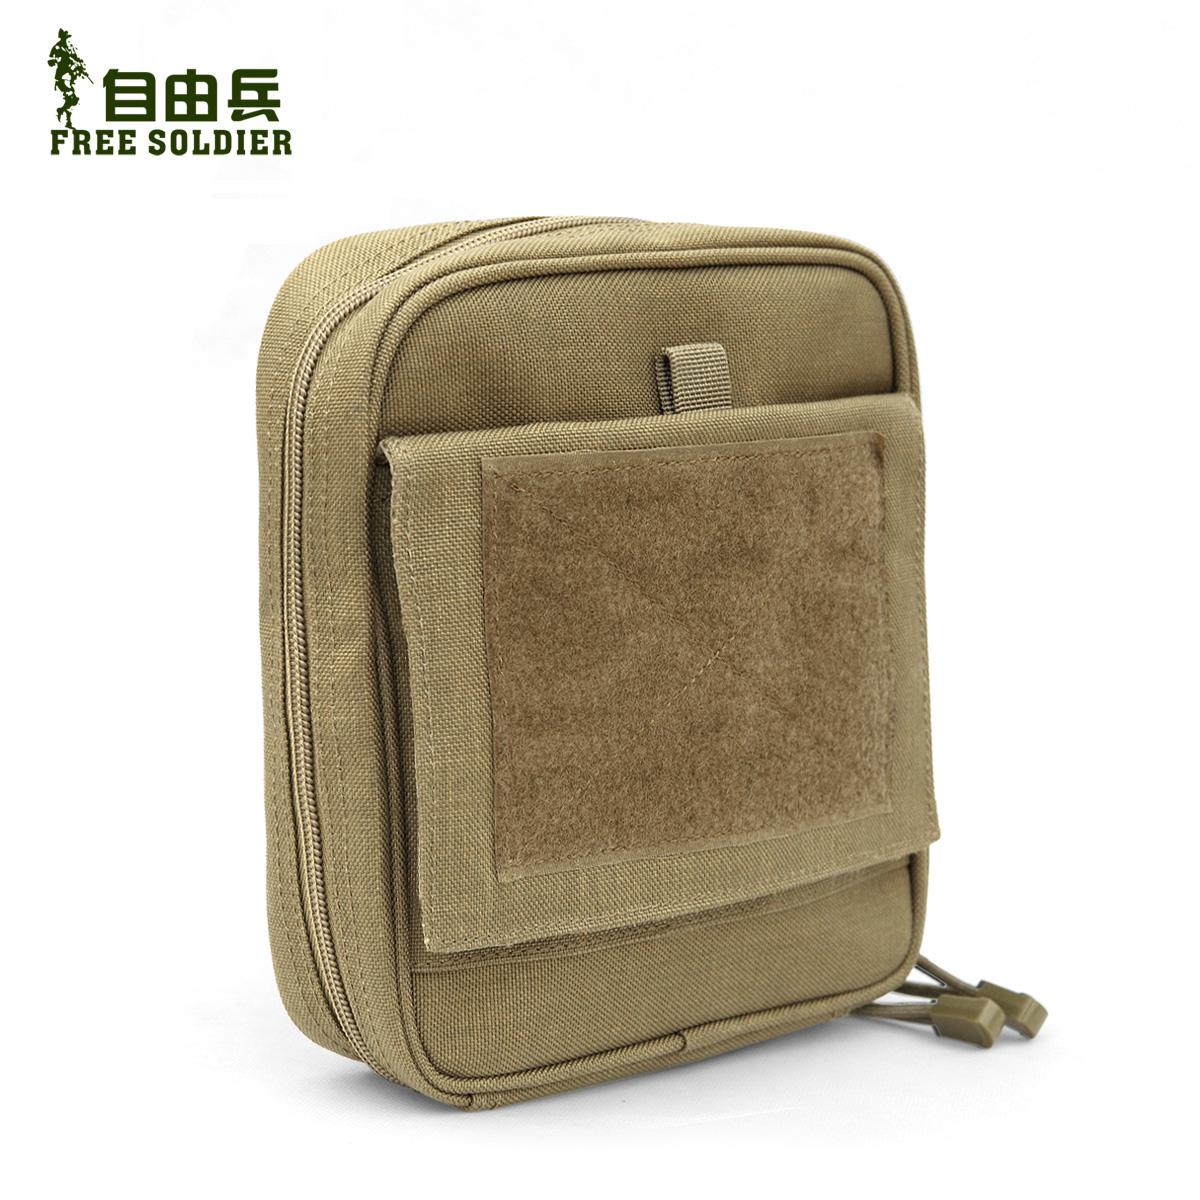 Tactical Travel Small Bag Super EDC Messenger Bag Small houlder bag Multifunctional Molle System Military Small Messenger Bag(China (Mainland))